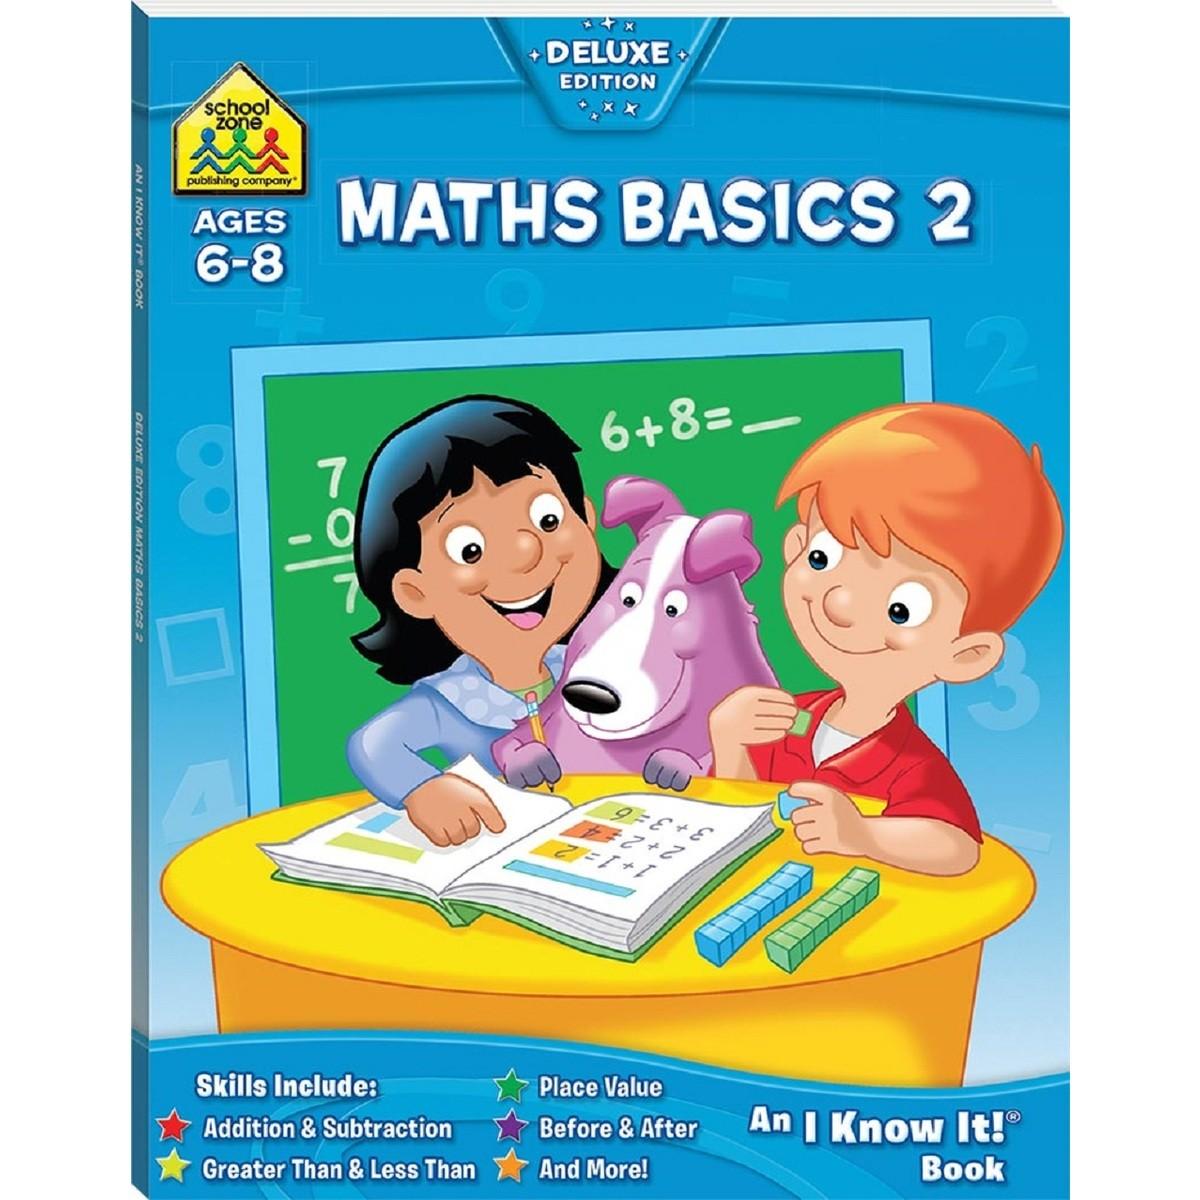 School Zone Maths Basics 2 I Know It Book